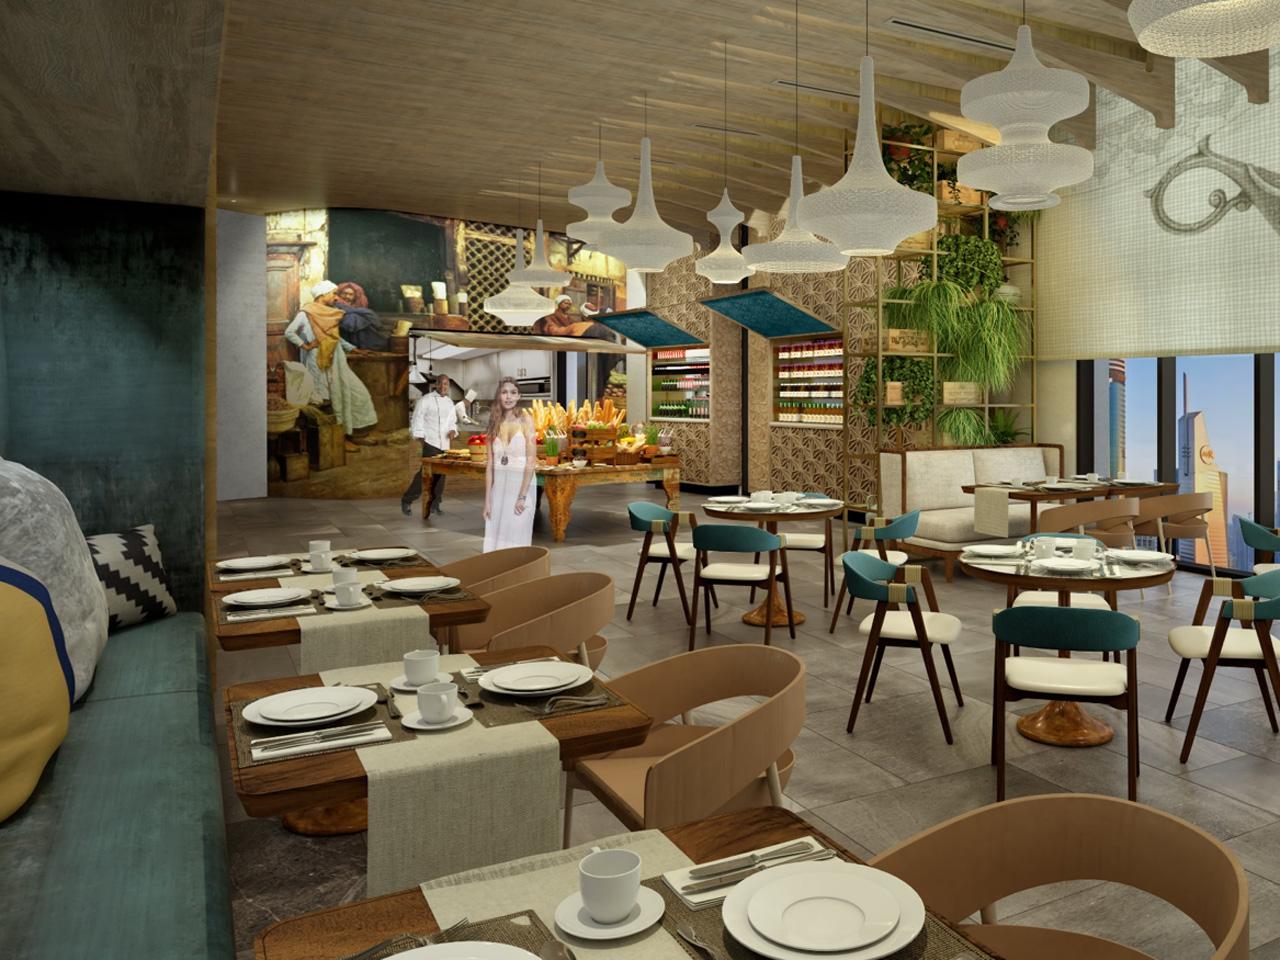 Hotel Indigo Dubai Downtown restaurant